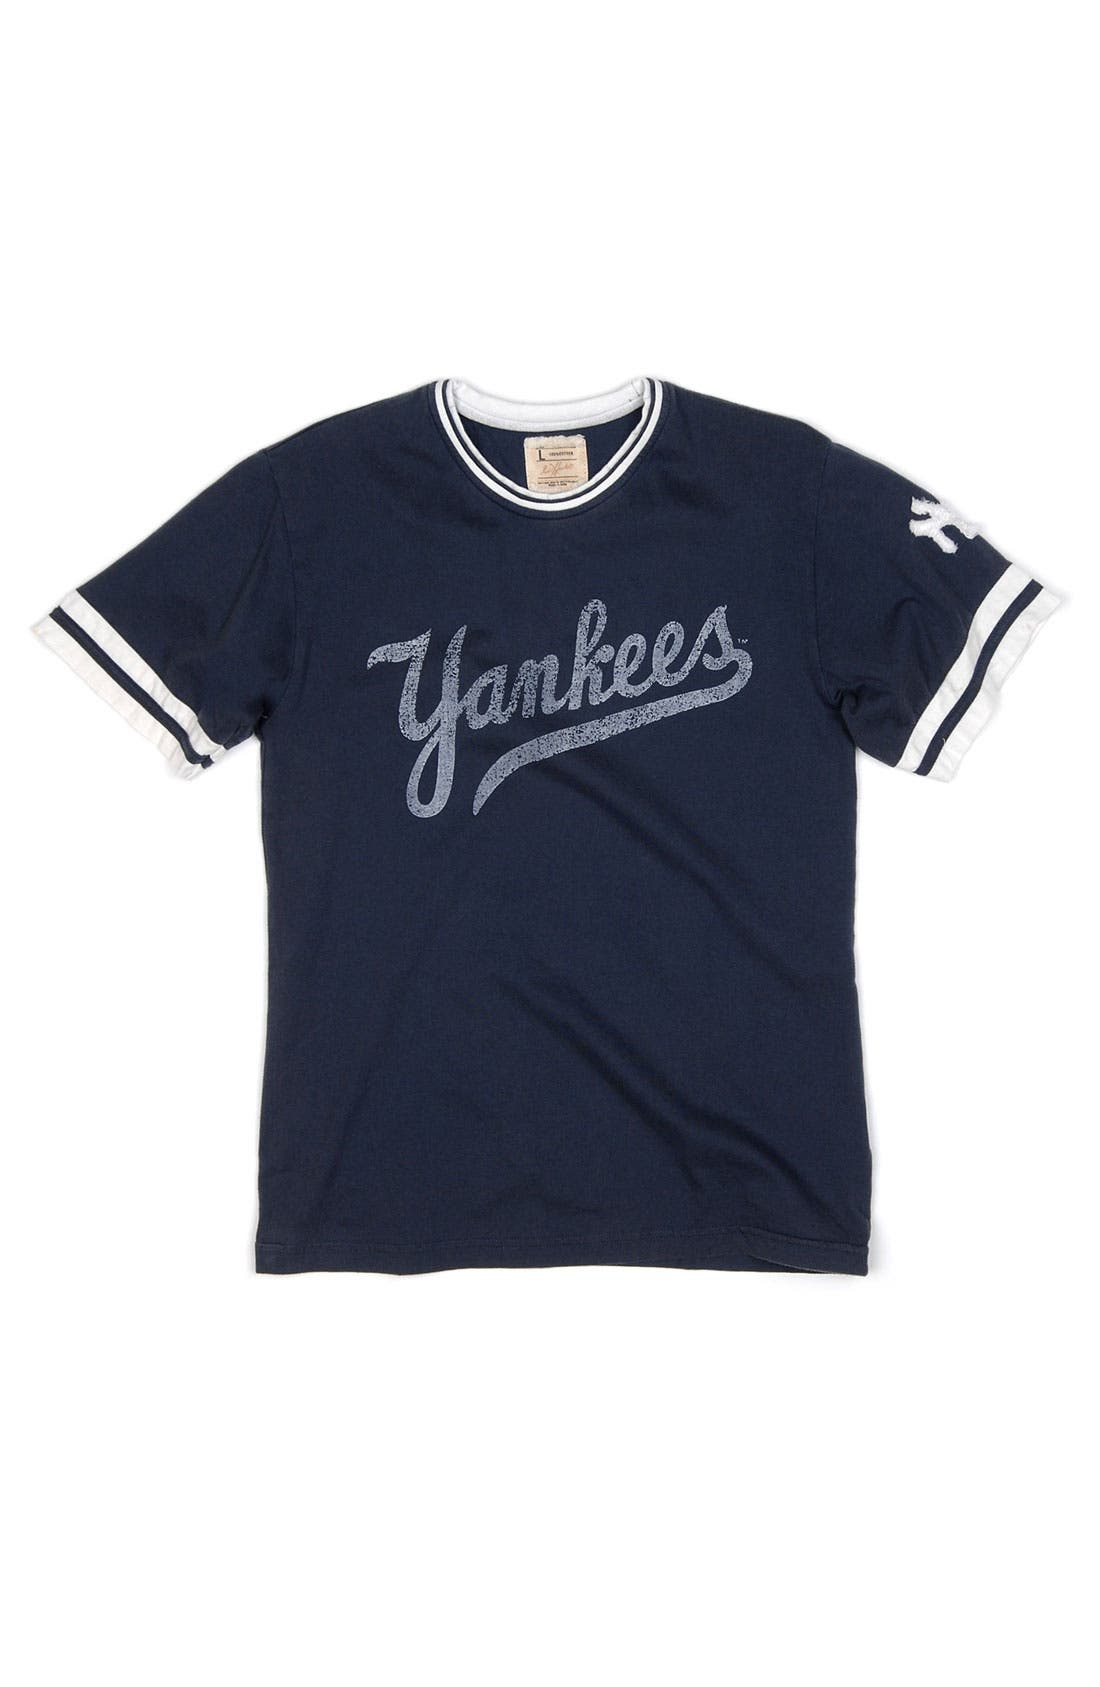 Alternate Image 1 Selected - Red Jacket 'New York Yankees' Trim Fit Ringer T-Shirt (Men)